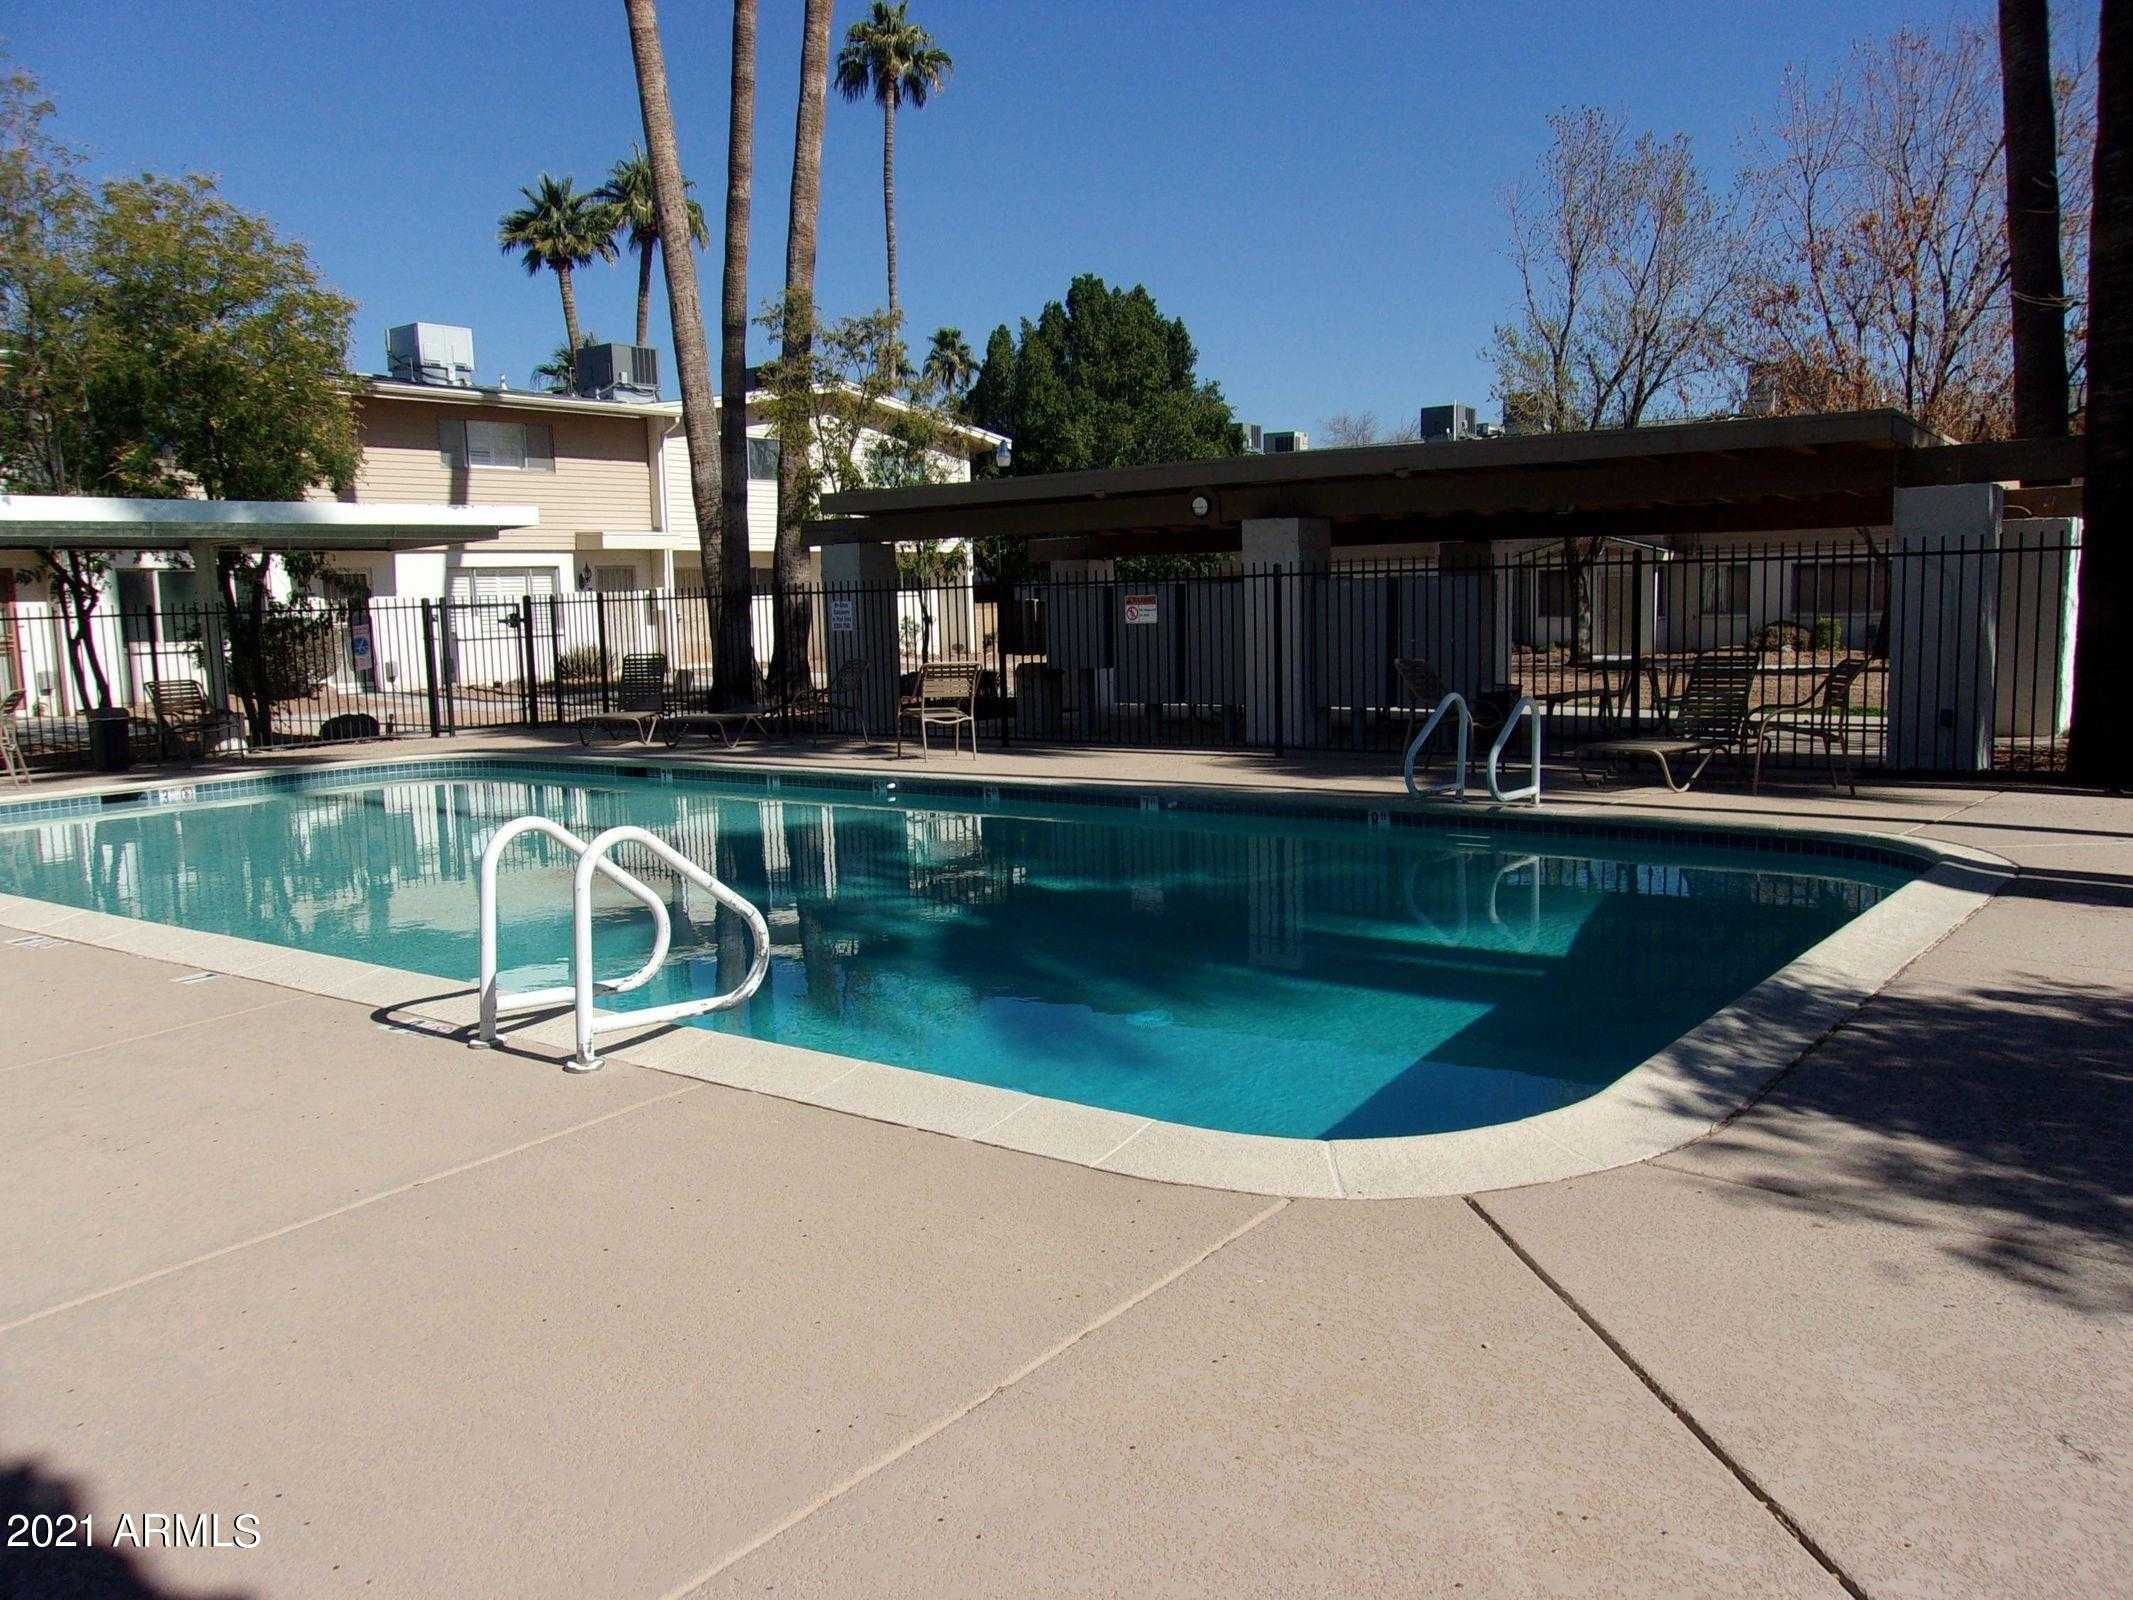 $90,000 - 1Br/1Ba -  for Sale in Scottsdale East Homes, Scottsdale